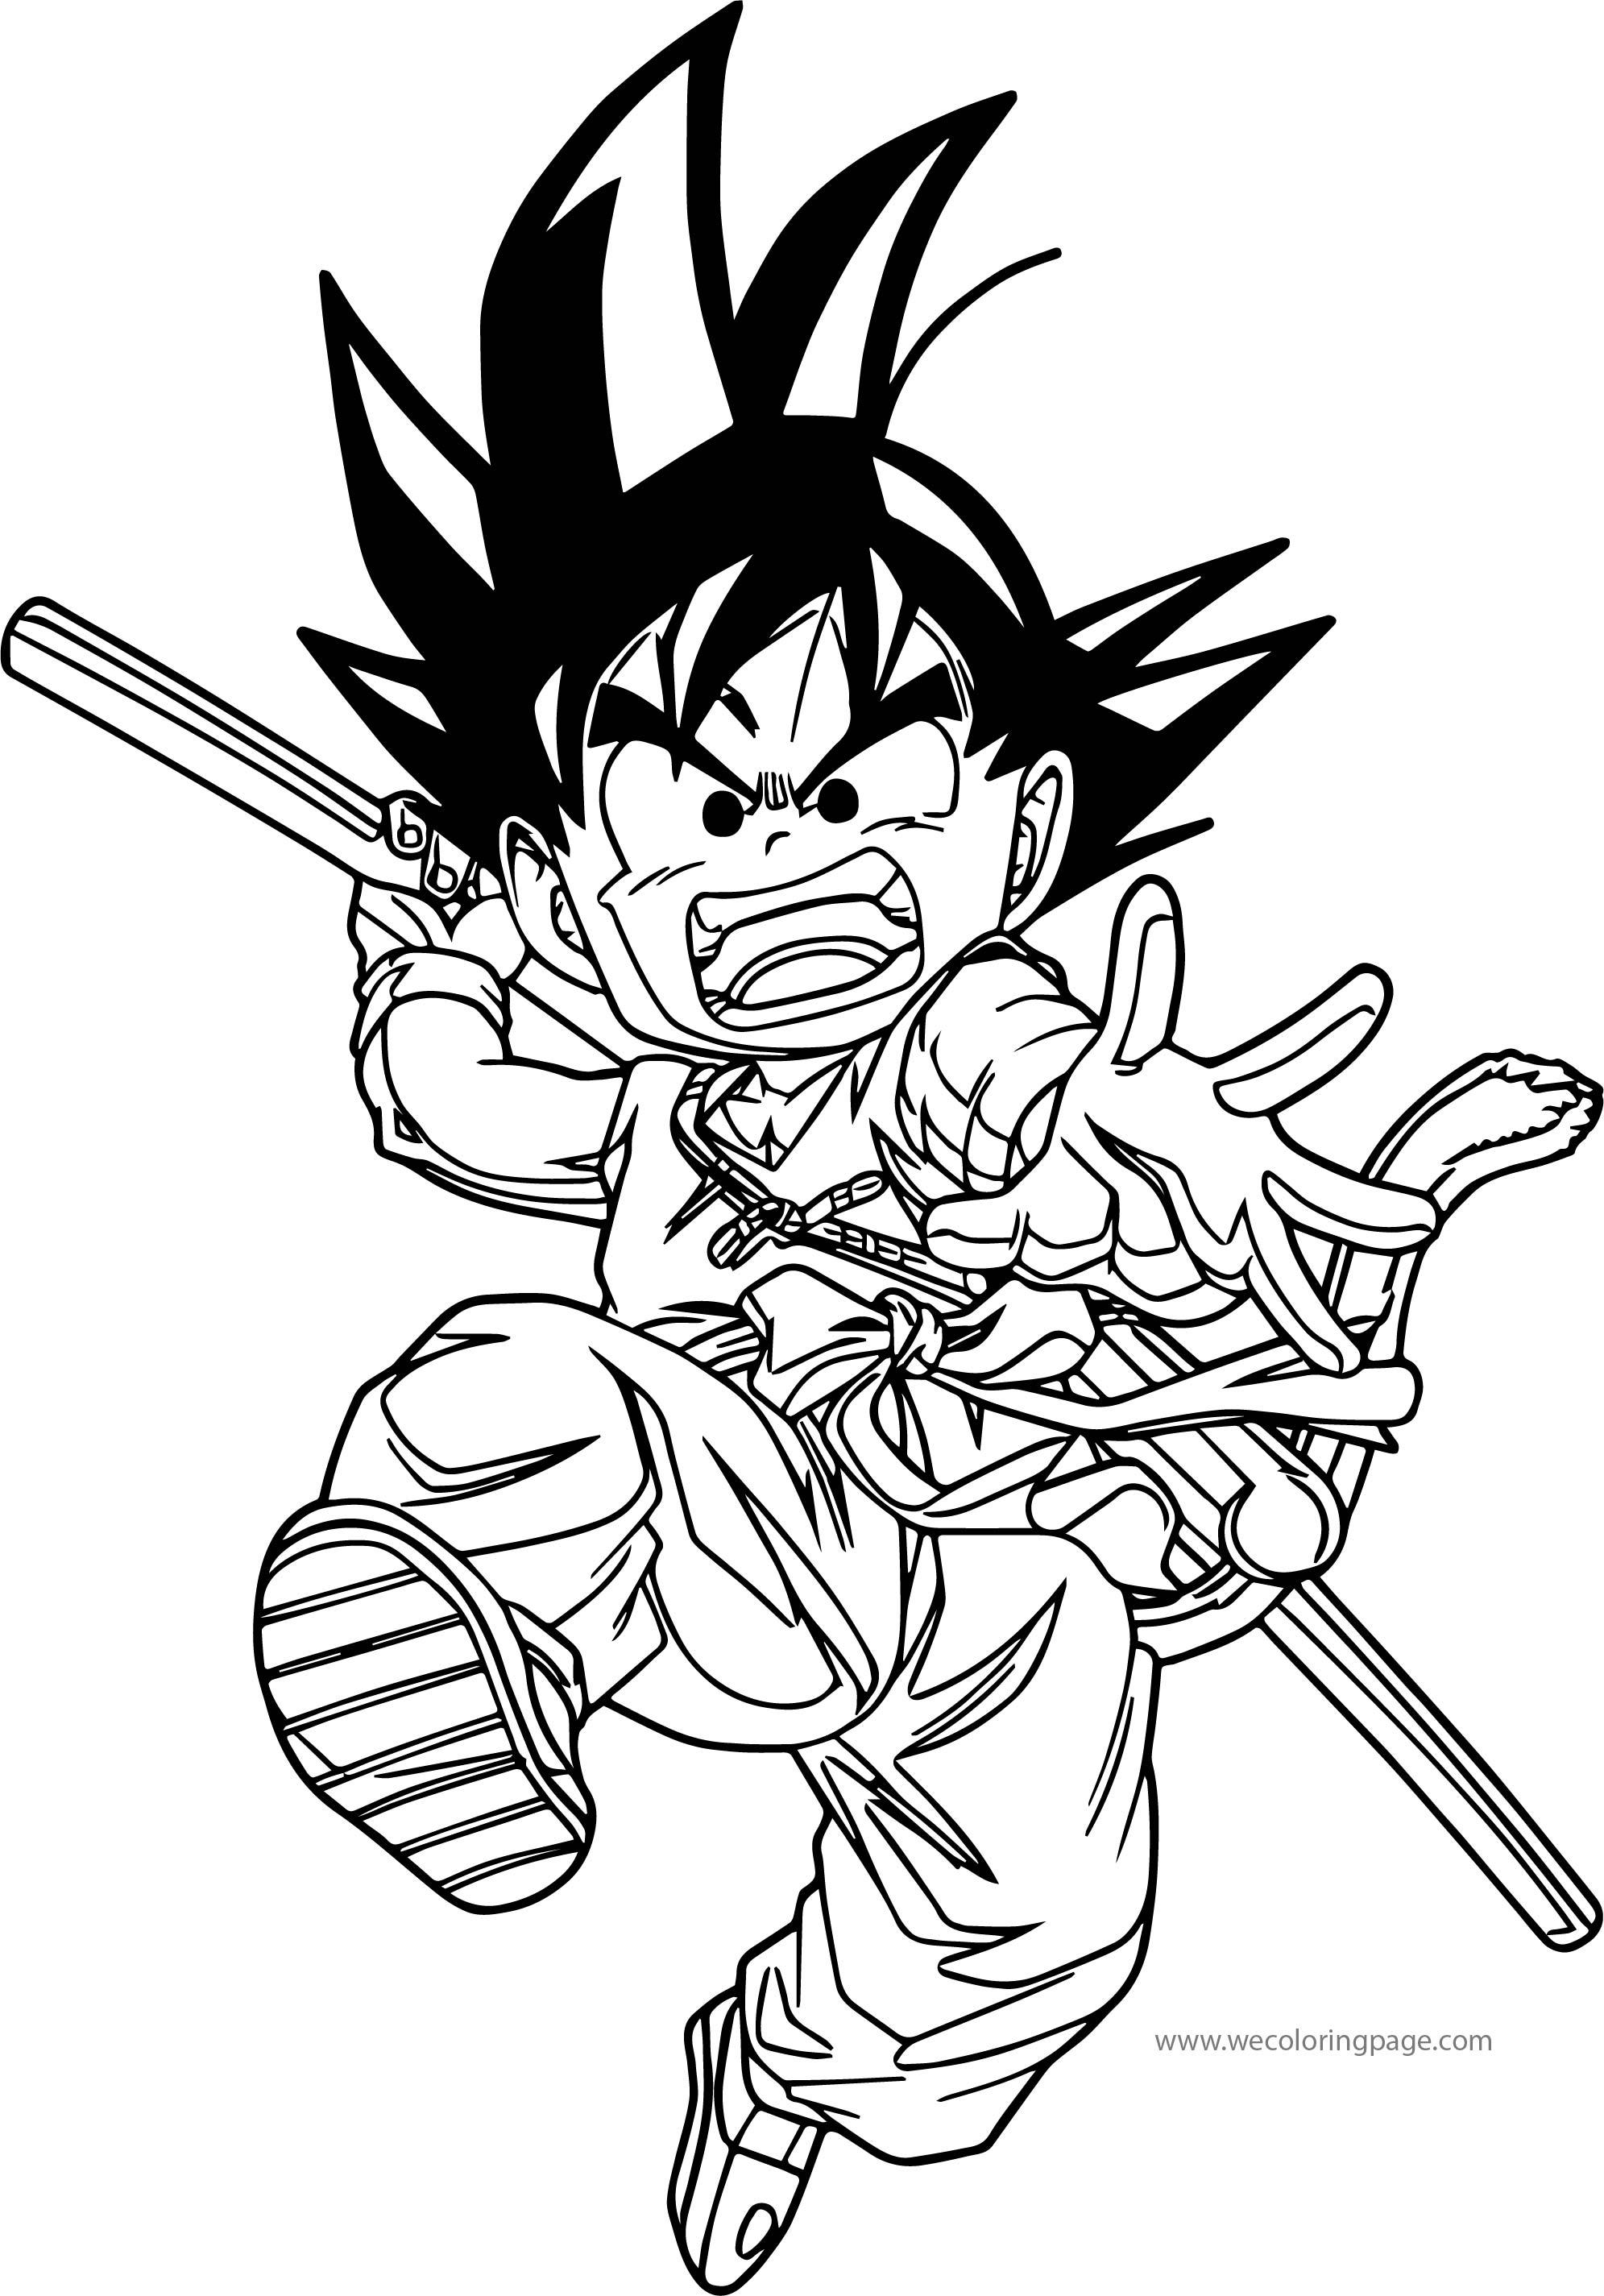 Goku Bat Kick Coloring Page | Wecoloringpage.com